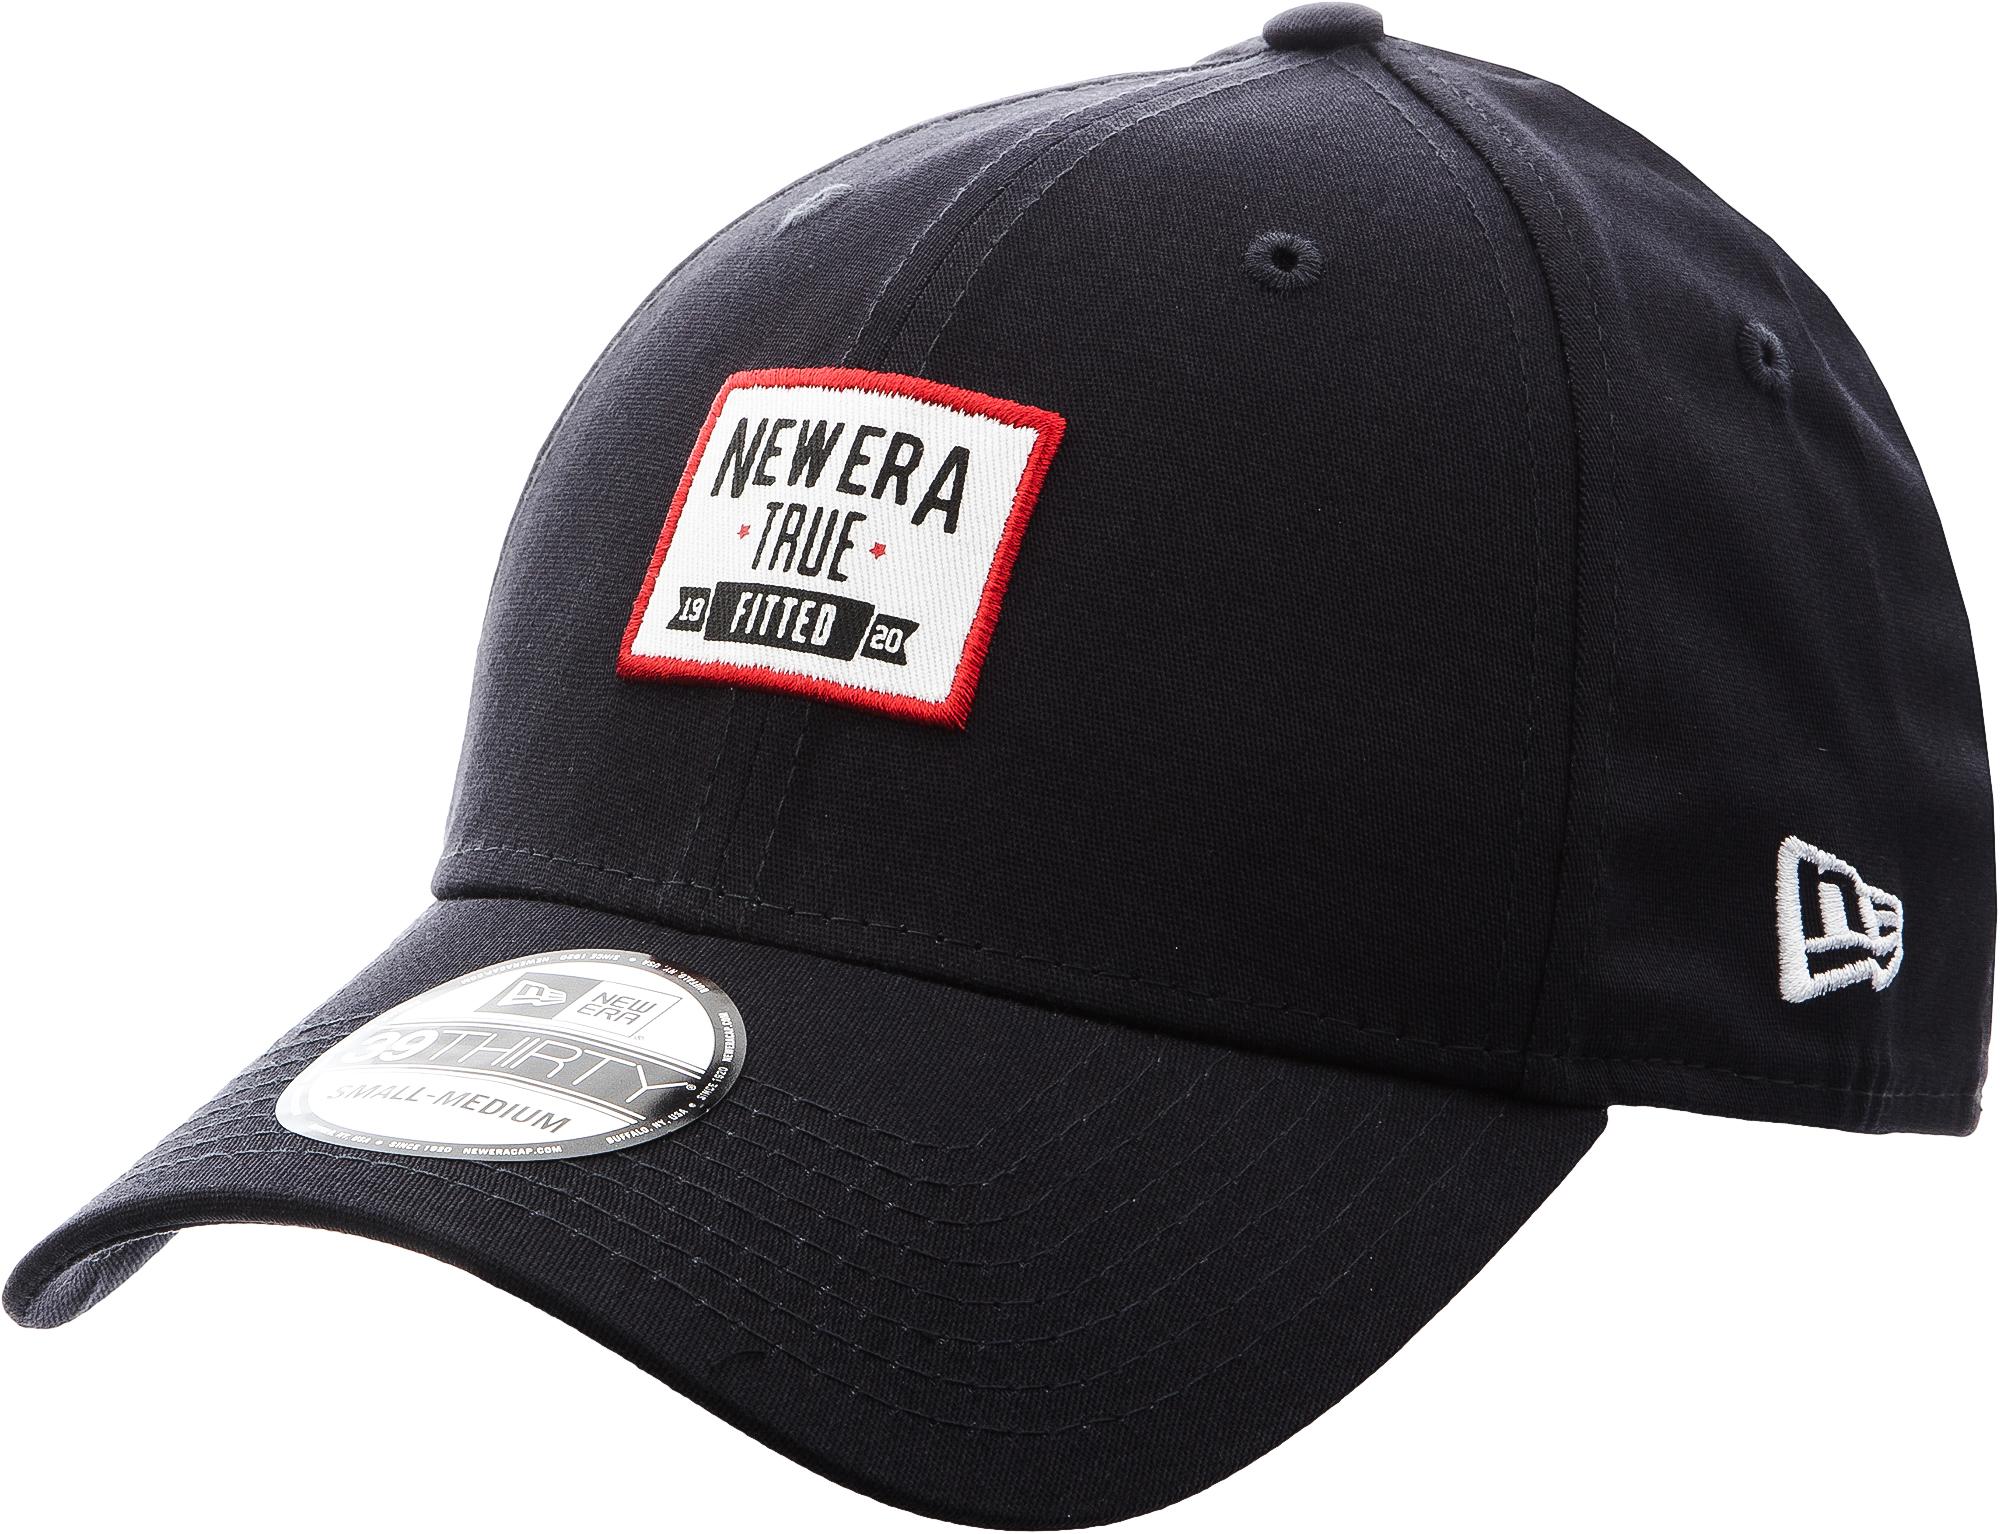 New Era Бейсболка New Era 325 True Fitters 39Thirty, размер 54-57